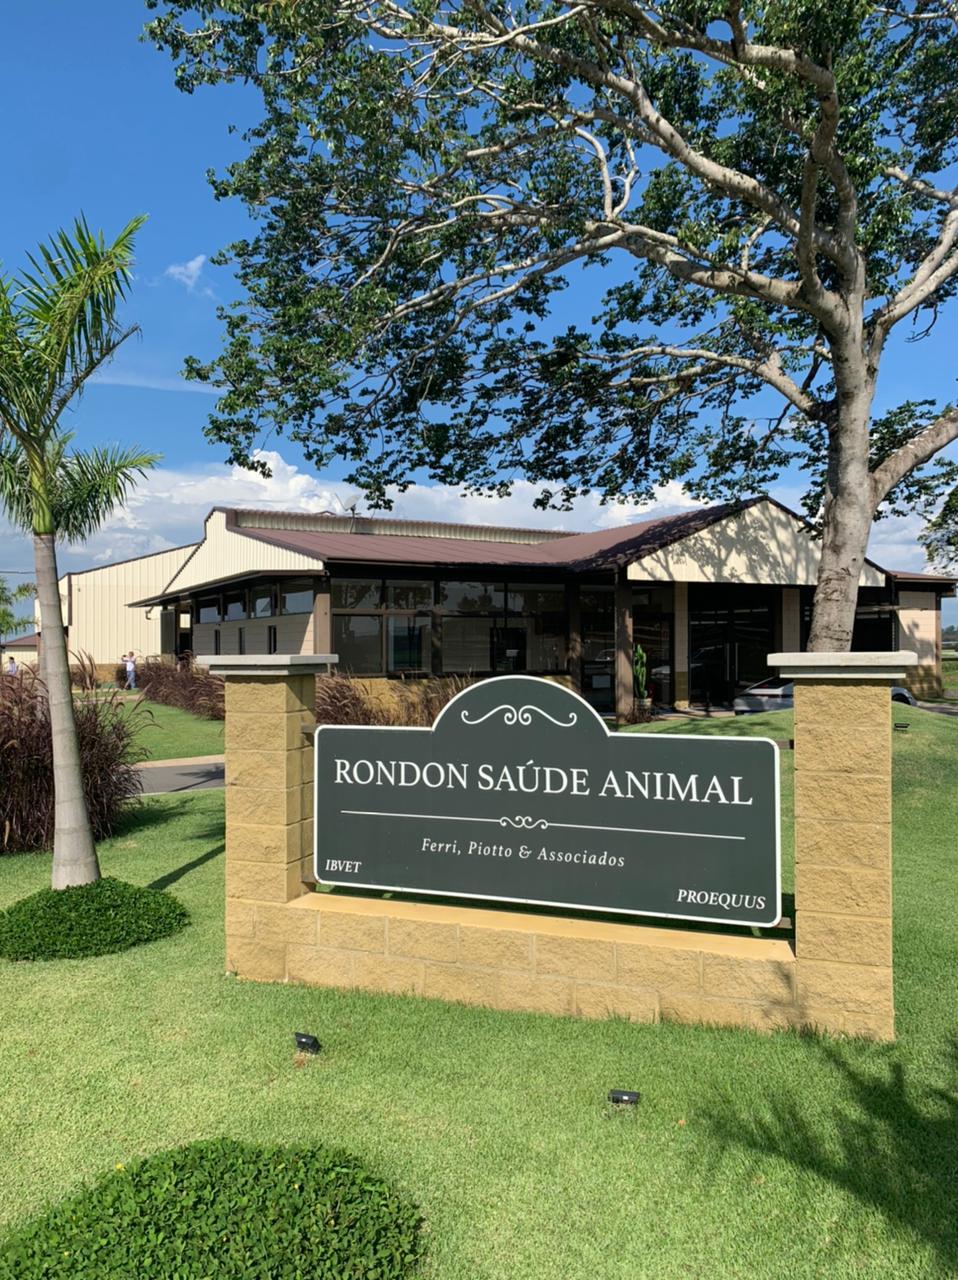 Rondon-Saude-Animal